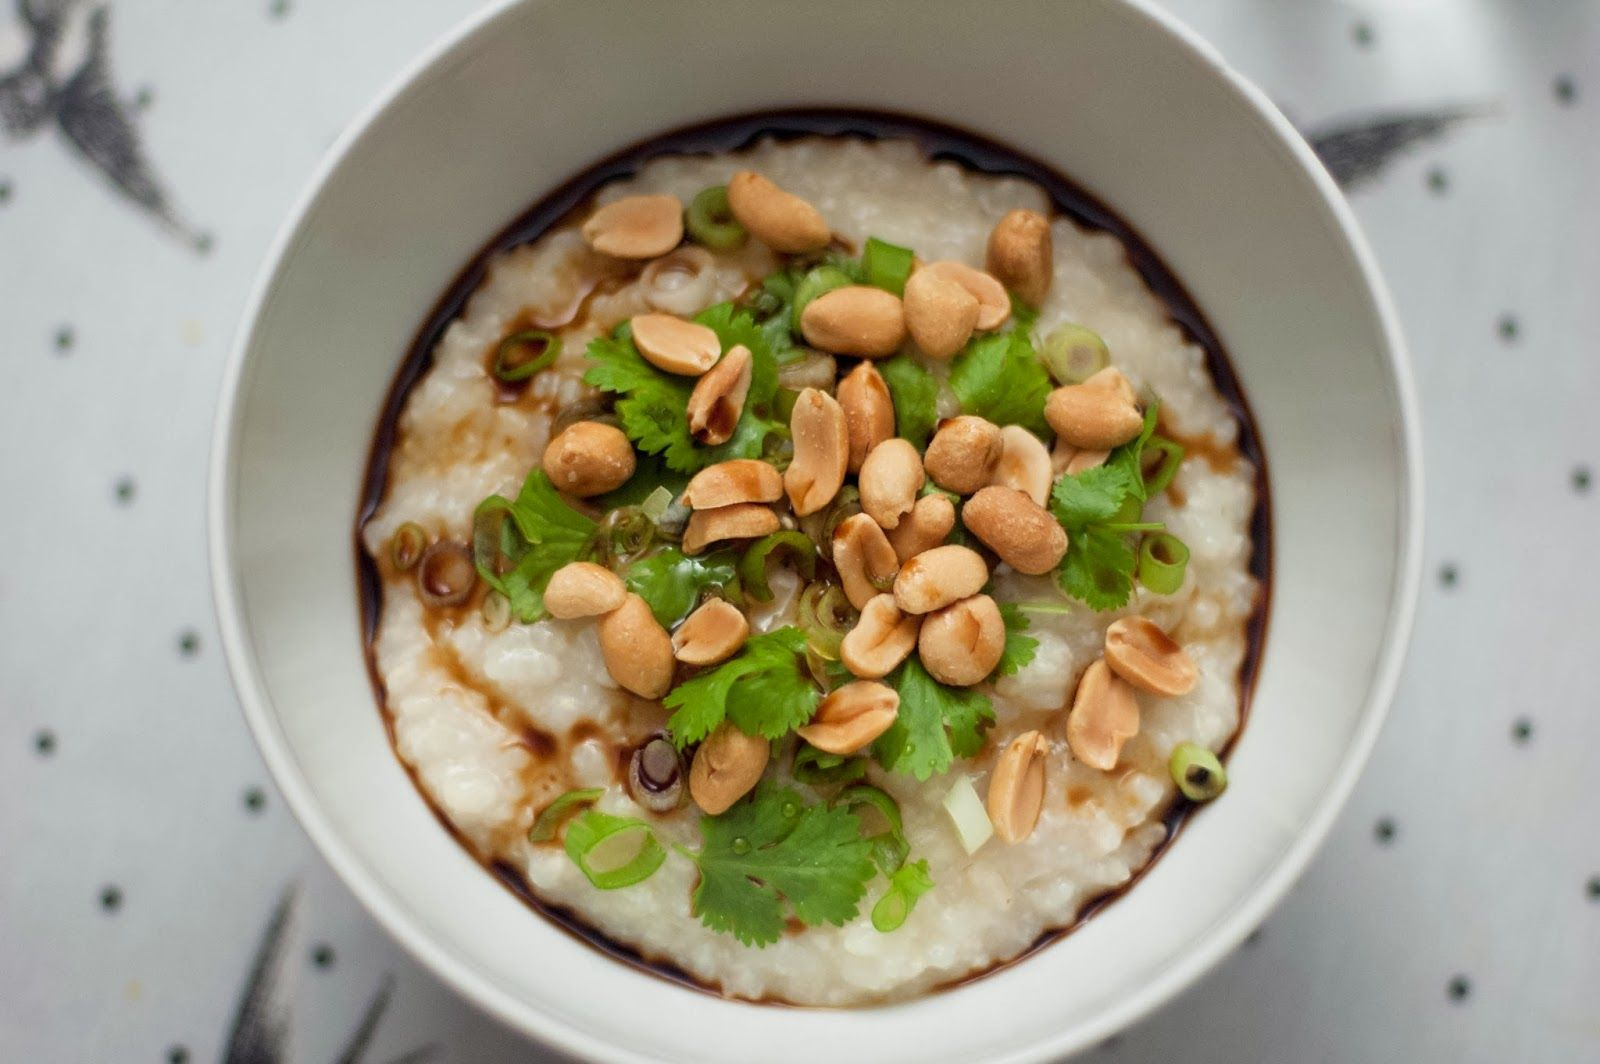 Matblogg: Asiatisk grøt med peanøtter/Congee